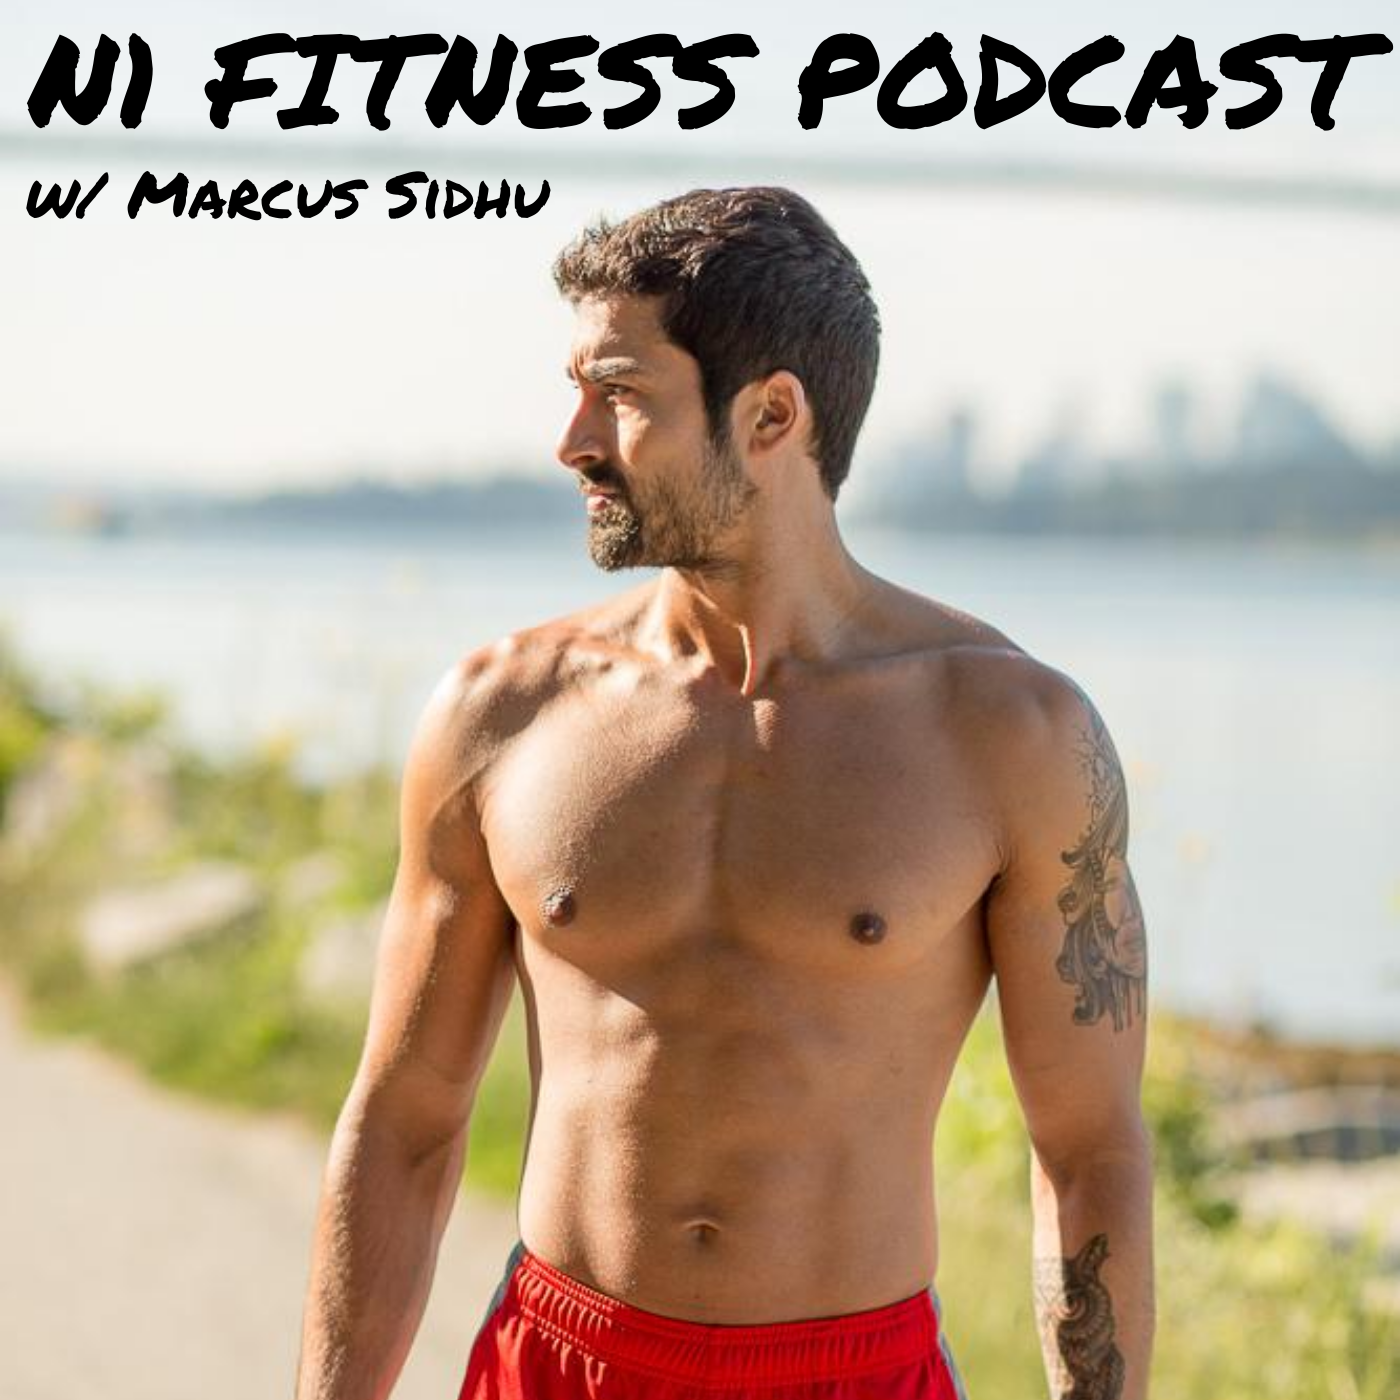 N1 Fitness Podcast show art